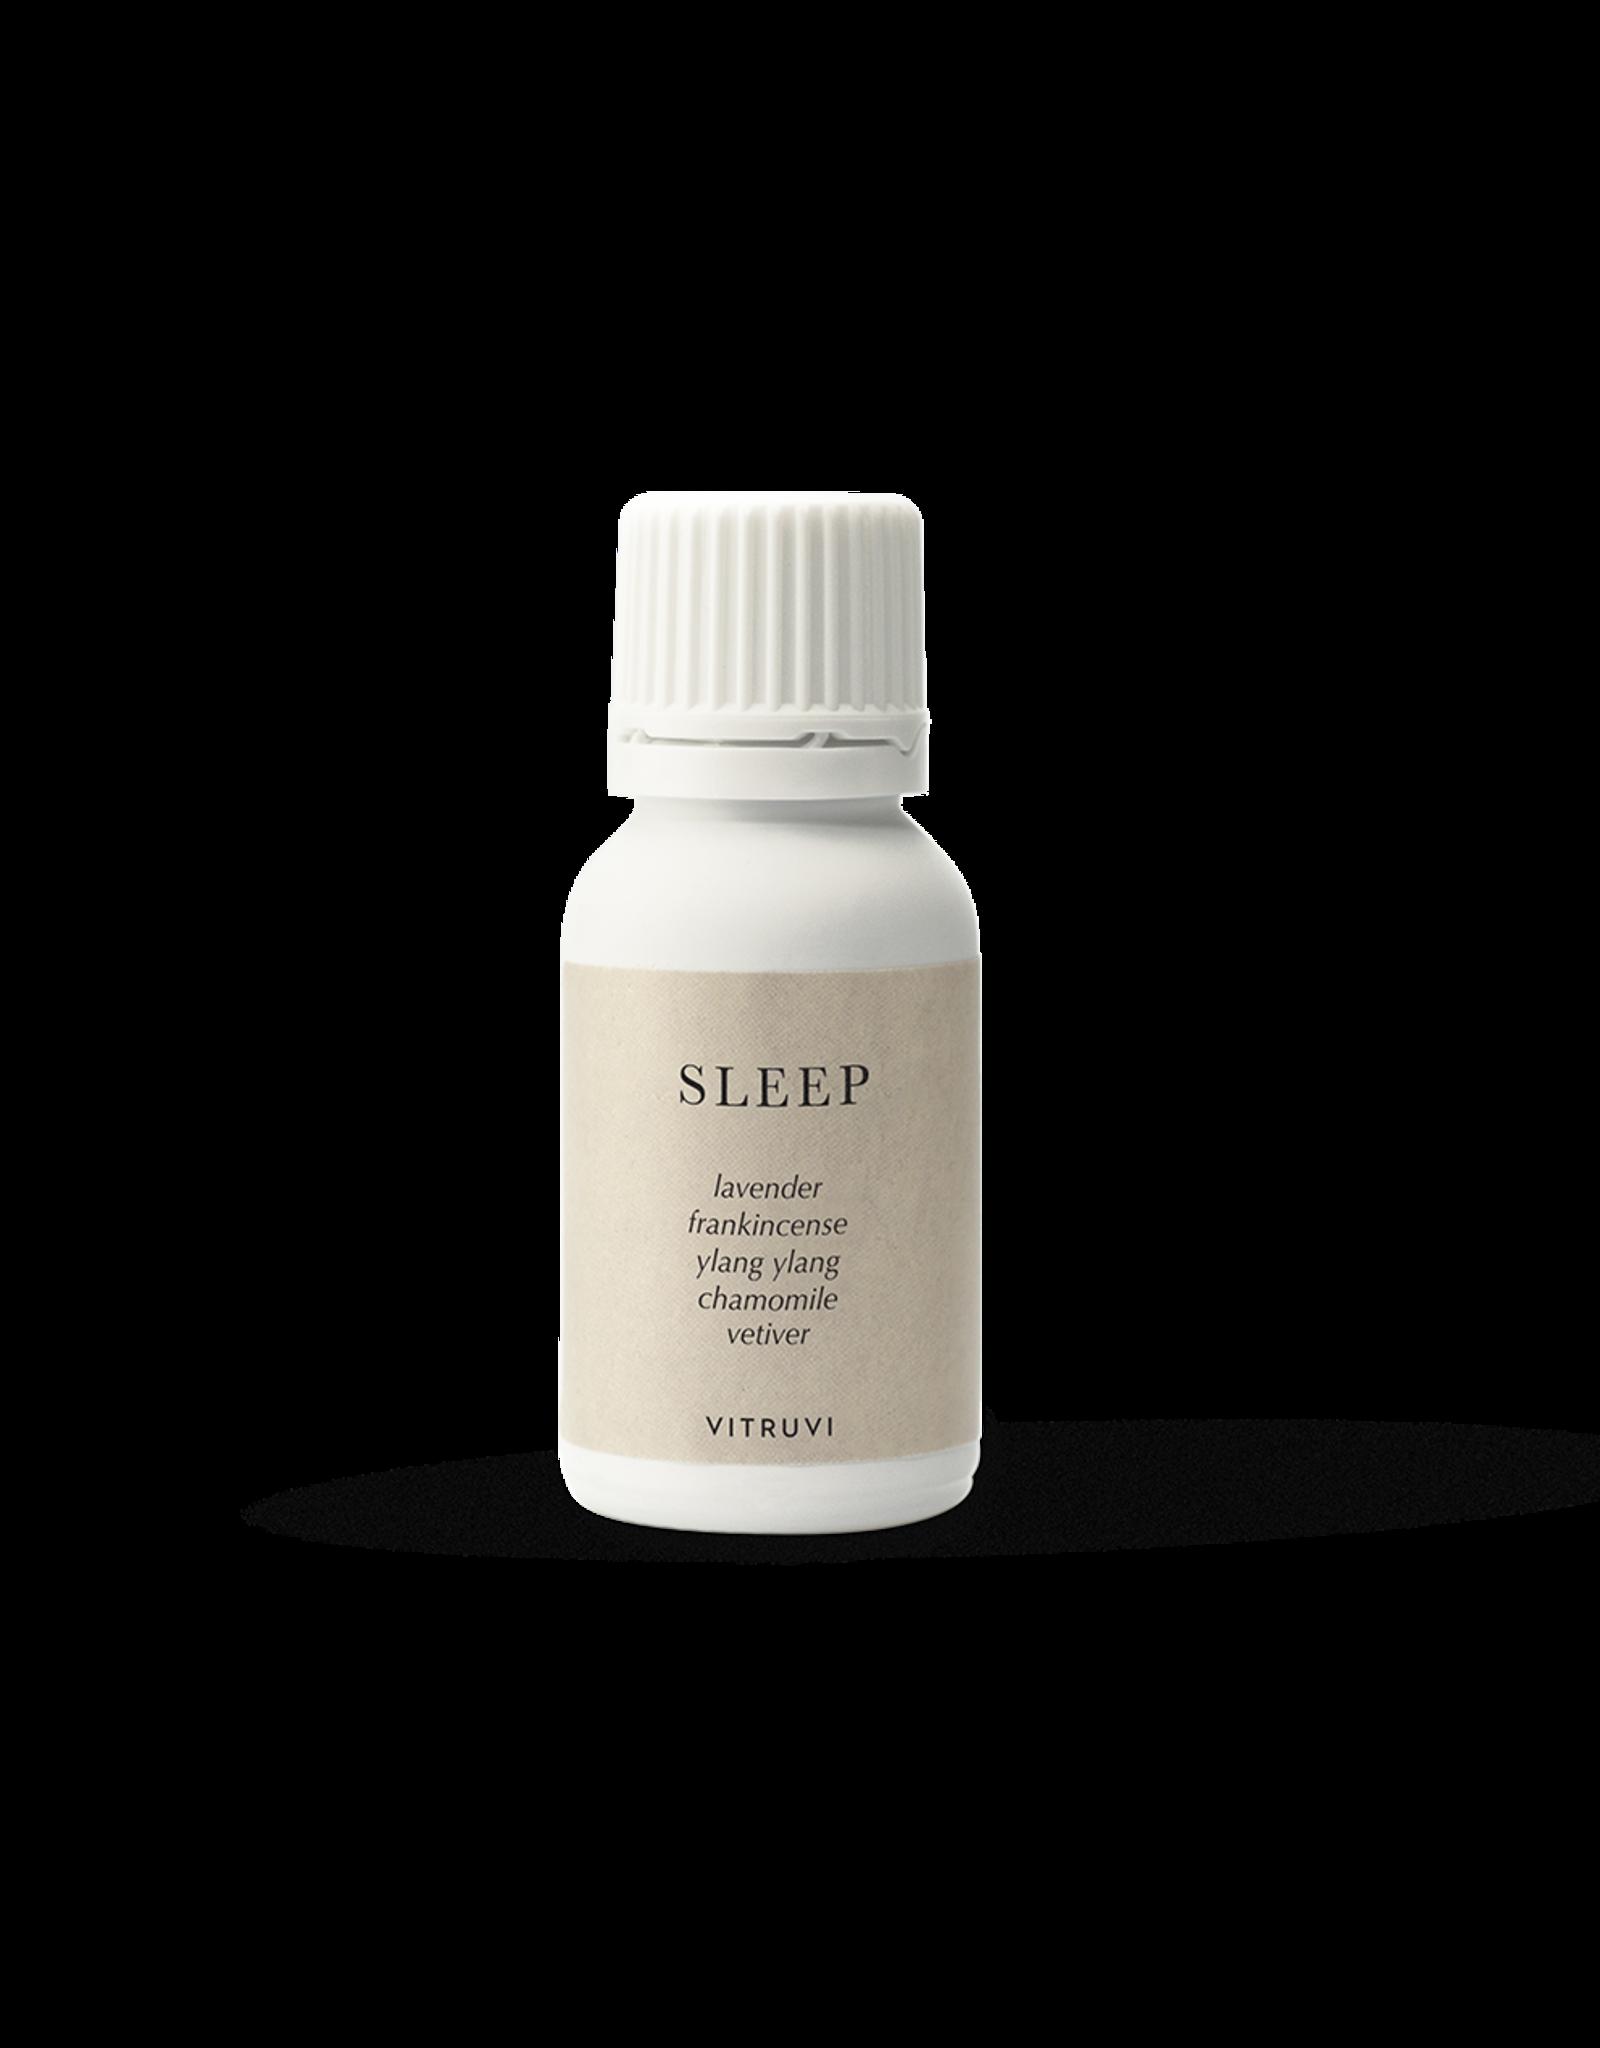 Vitruvi Sleep Blend